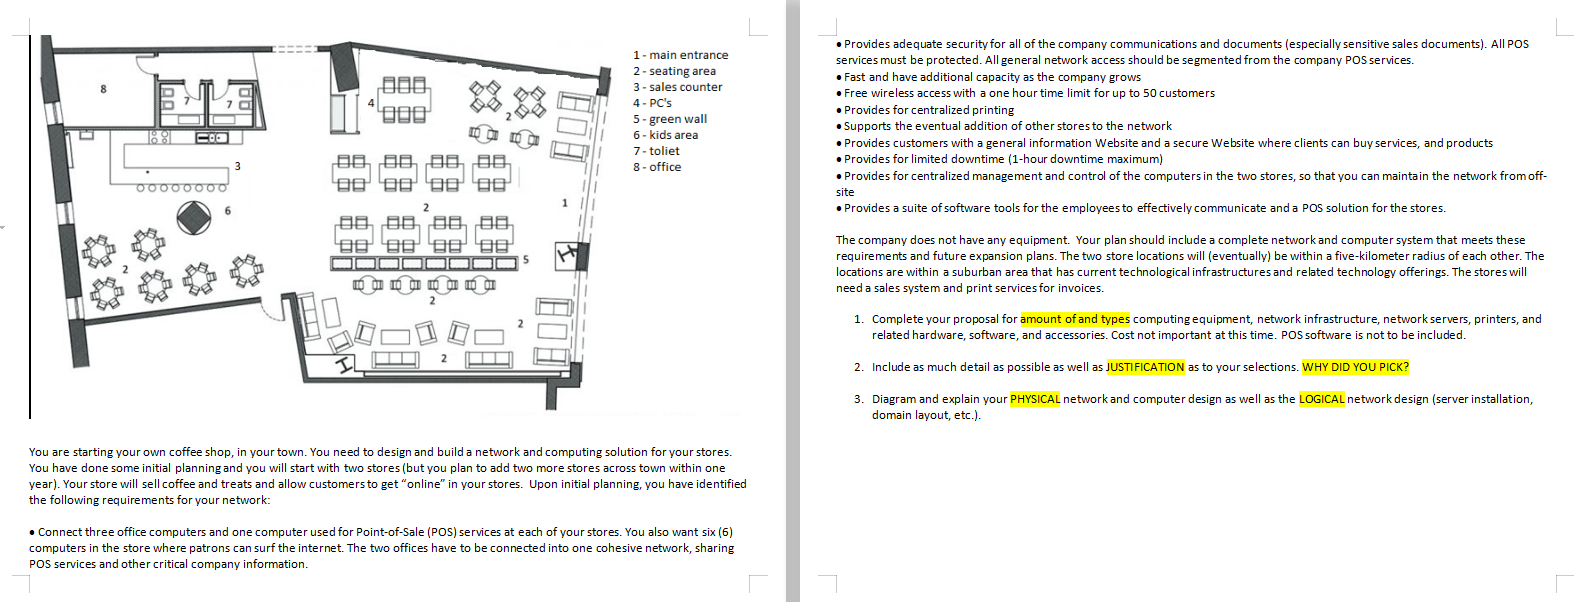 Diagram And Explain The Physical Network And Compu Chegg Com